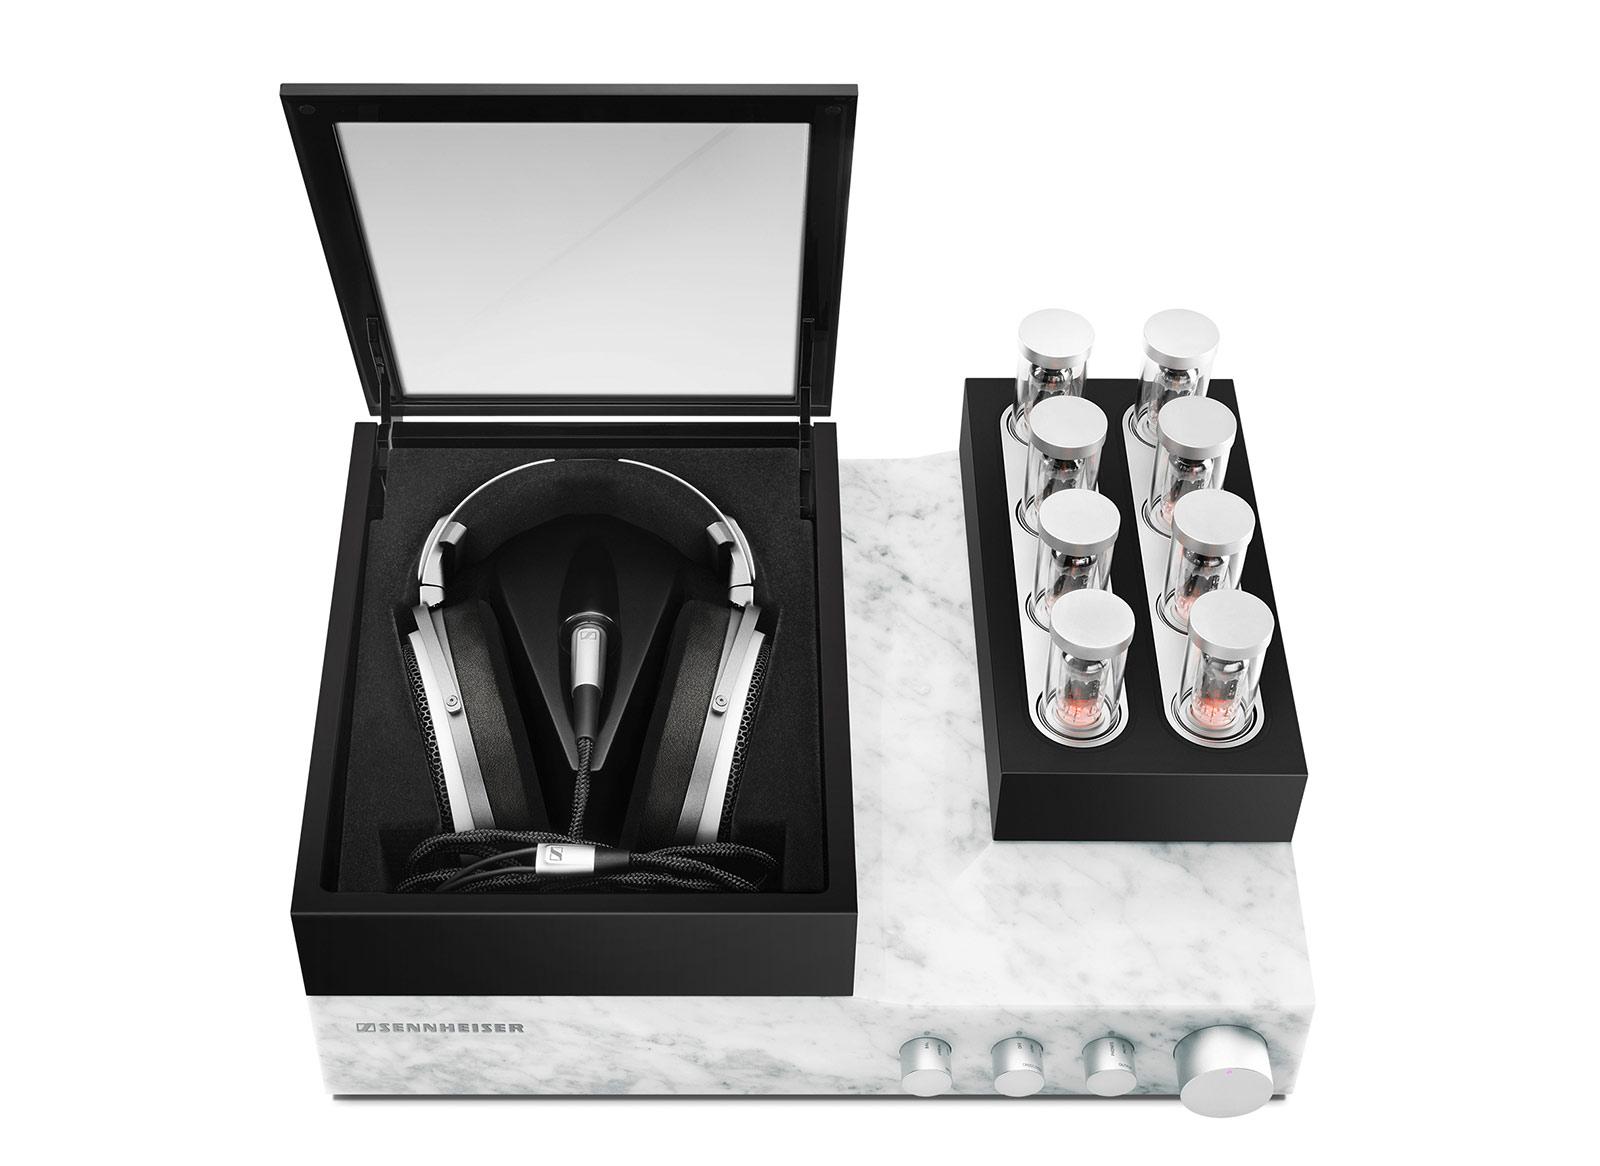 Sennheiser's Orpheus headphones will set you back a cool $50k